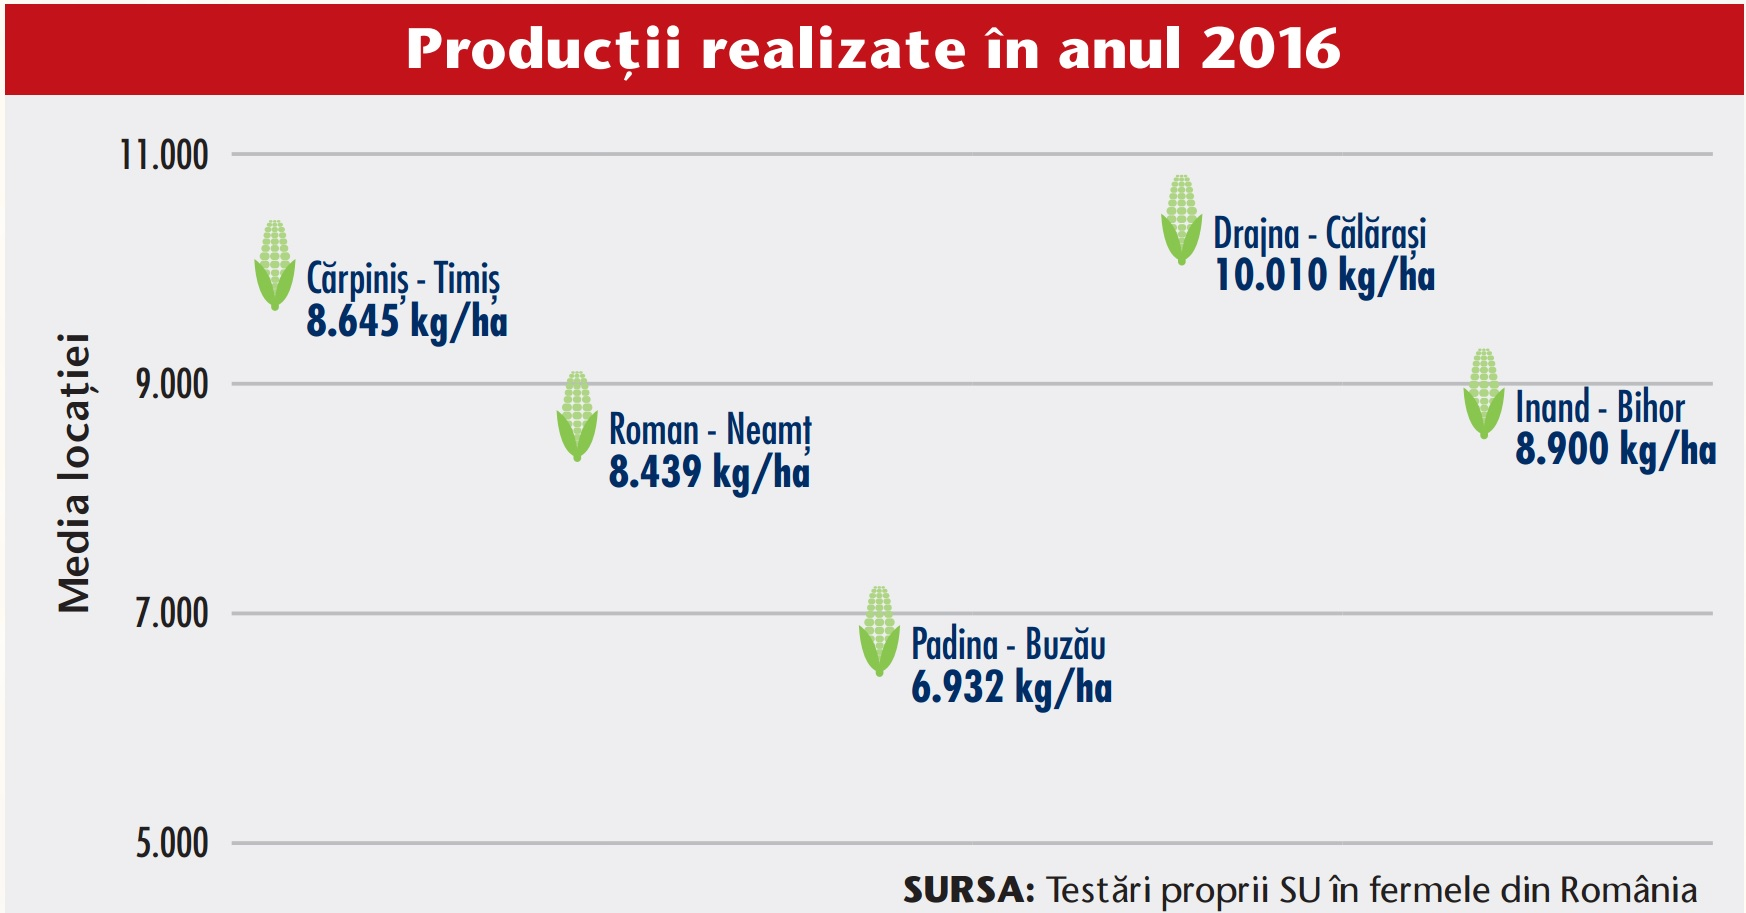 Productii realizate hibrid porumb Suanito 300